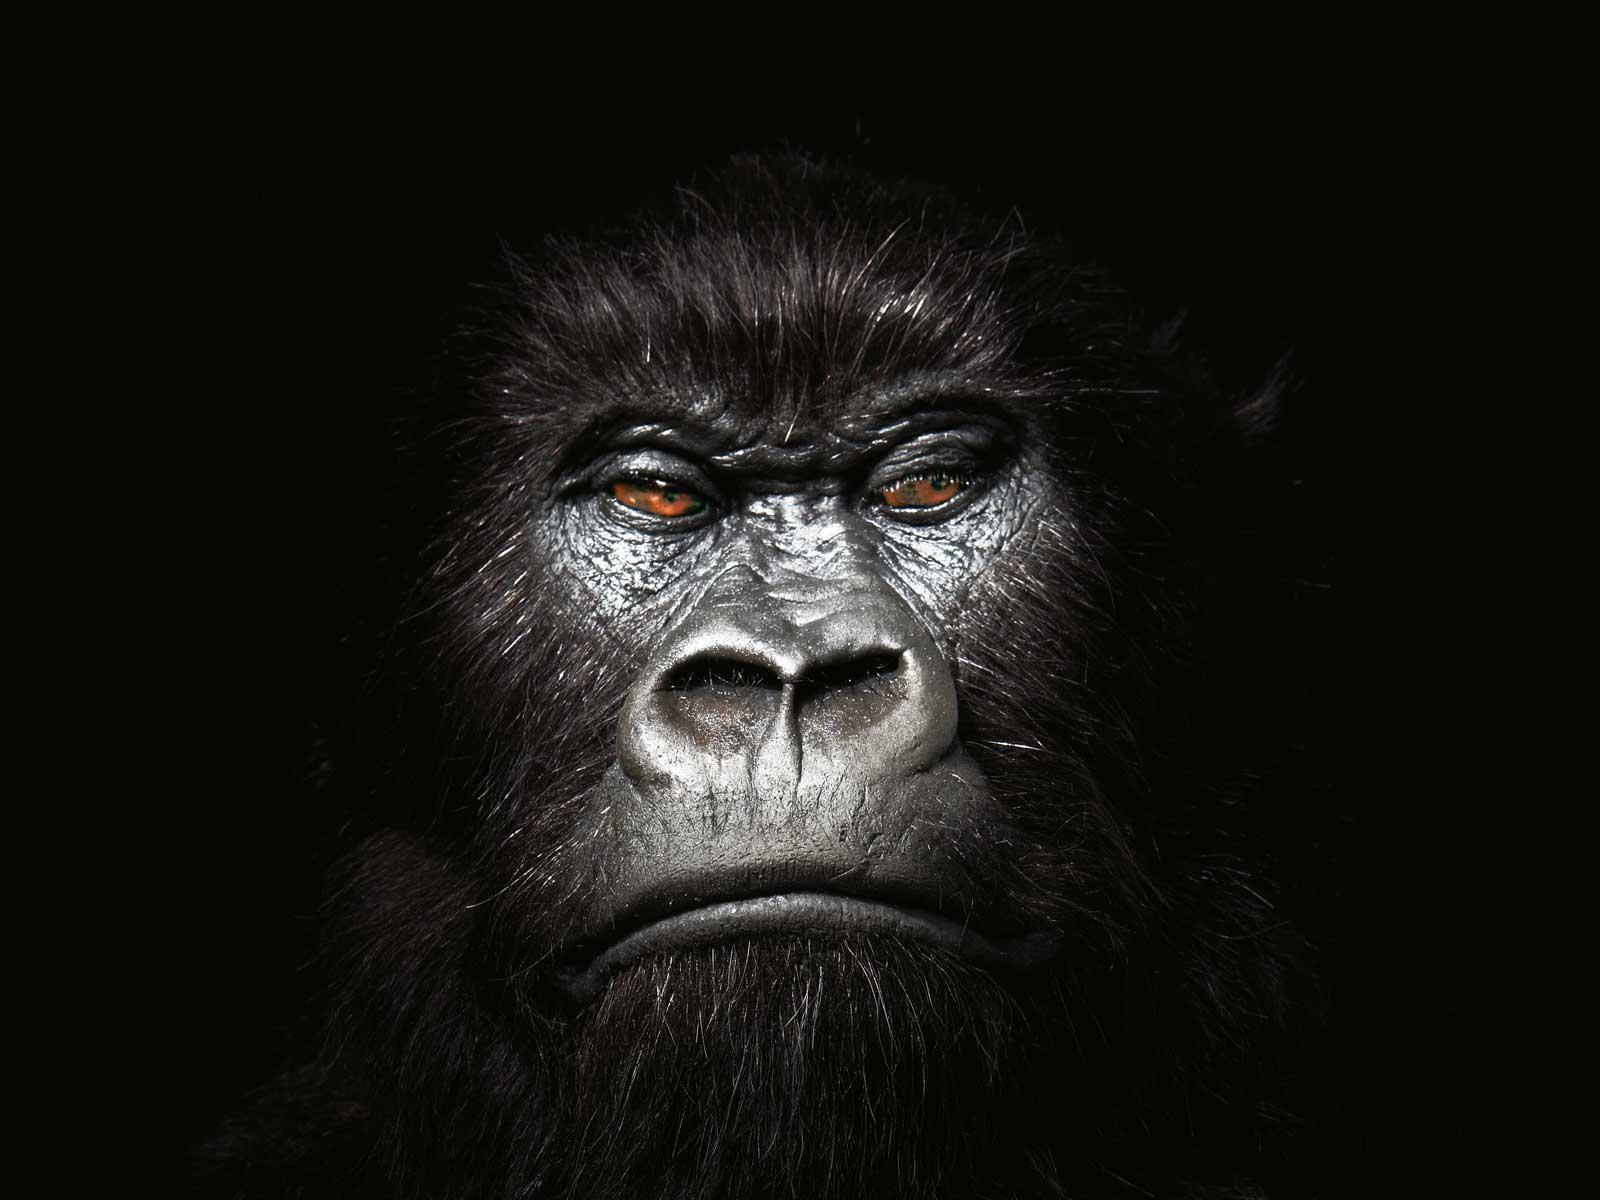 Gorilla Wallpaper 1600x1200